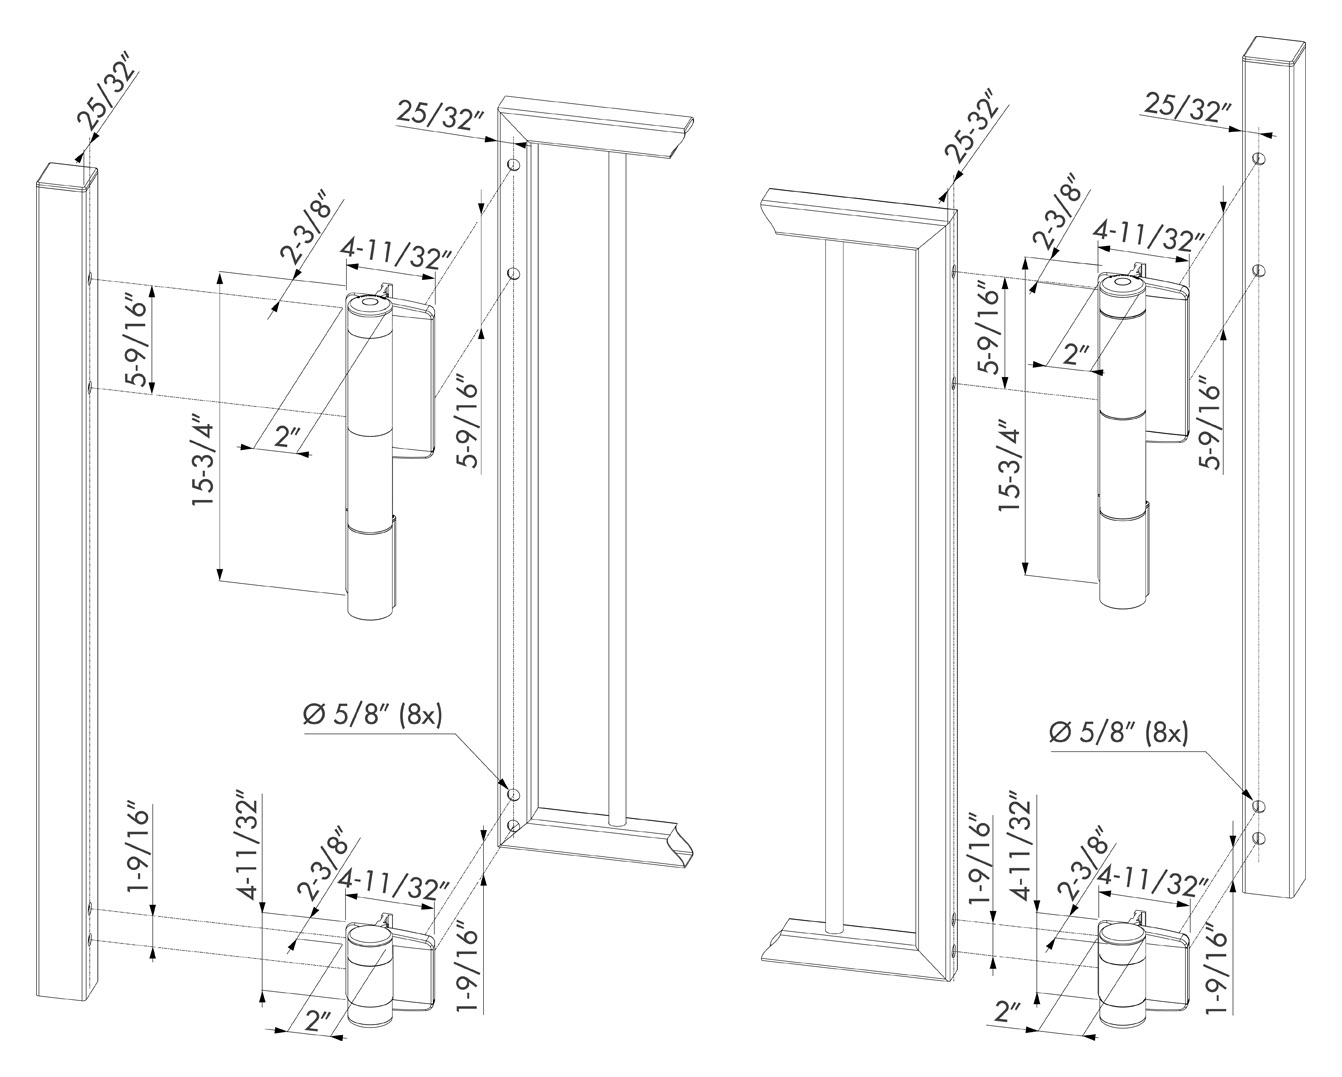 Locinox Mammoth180 Self-Closing Hinge Set | Hoover Fence Co. on